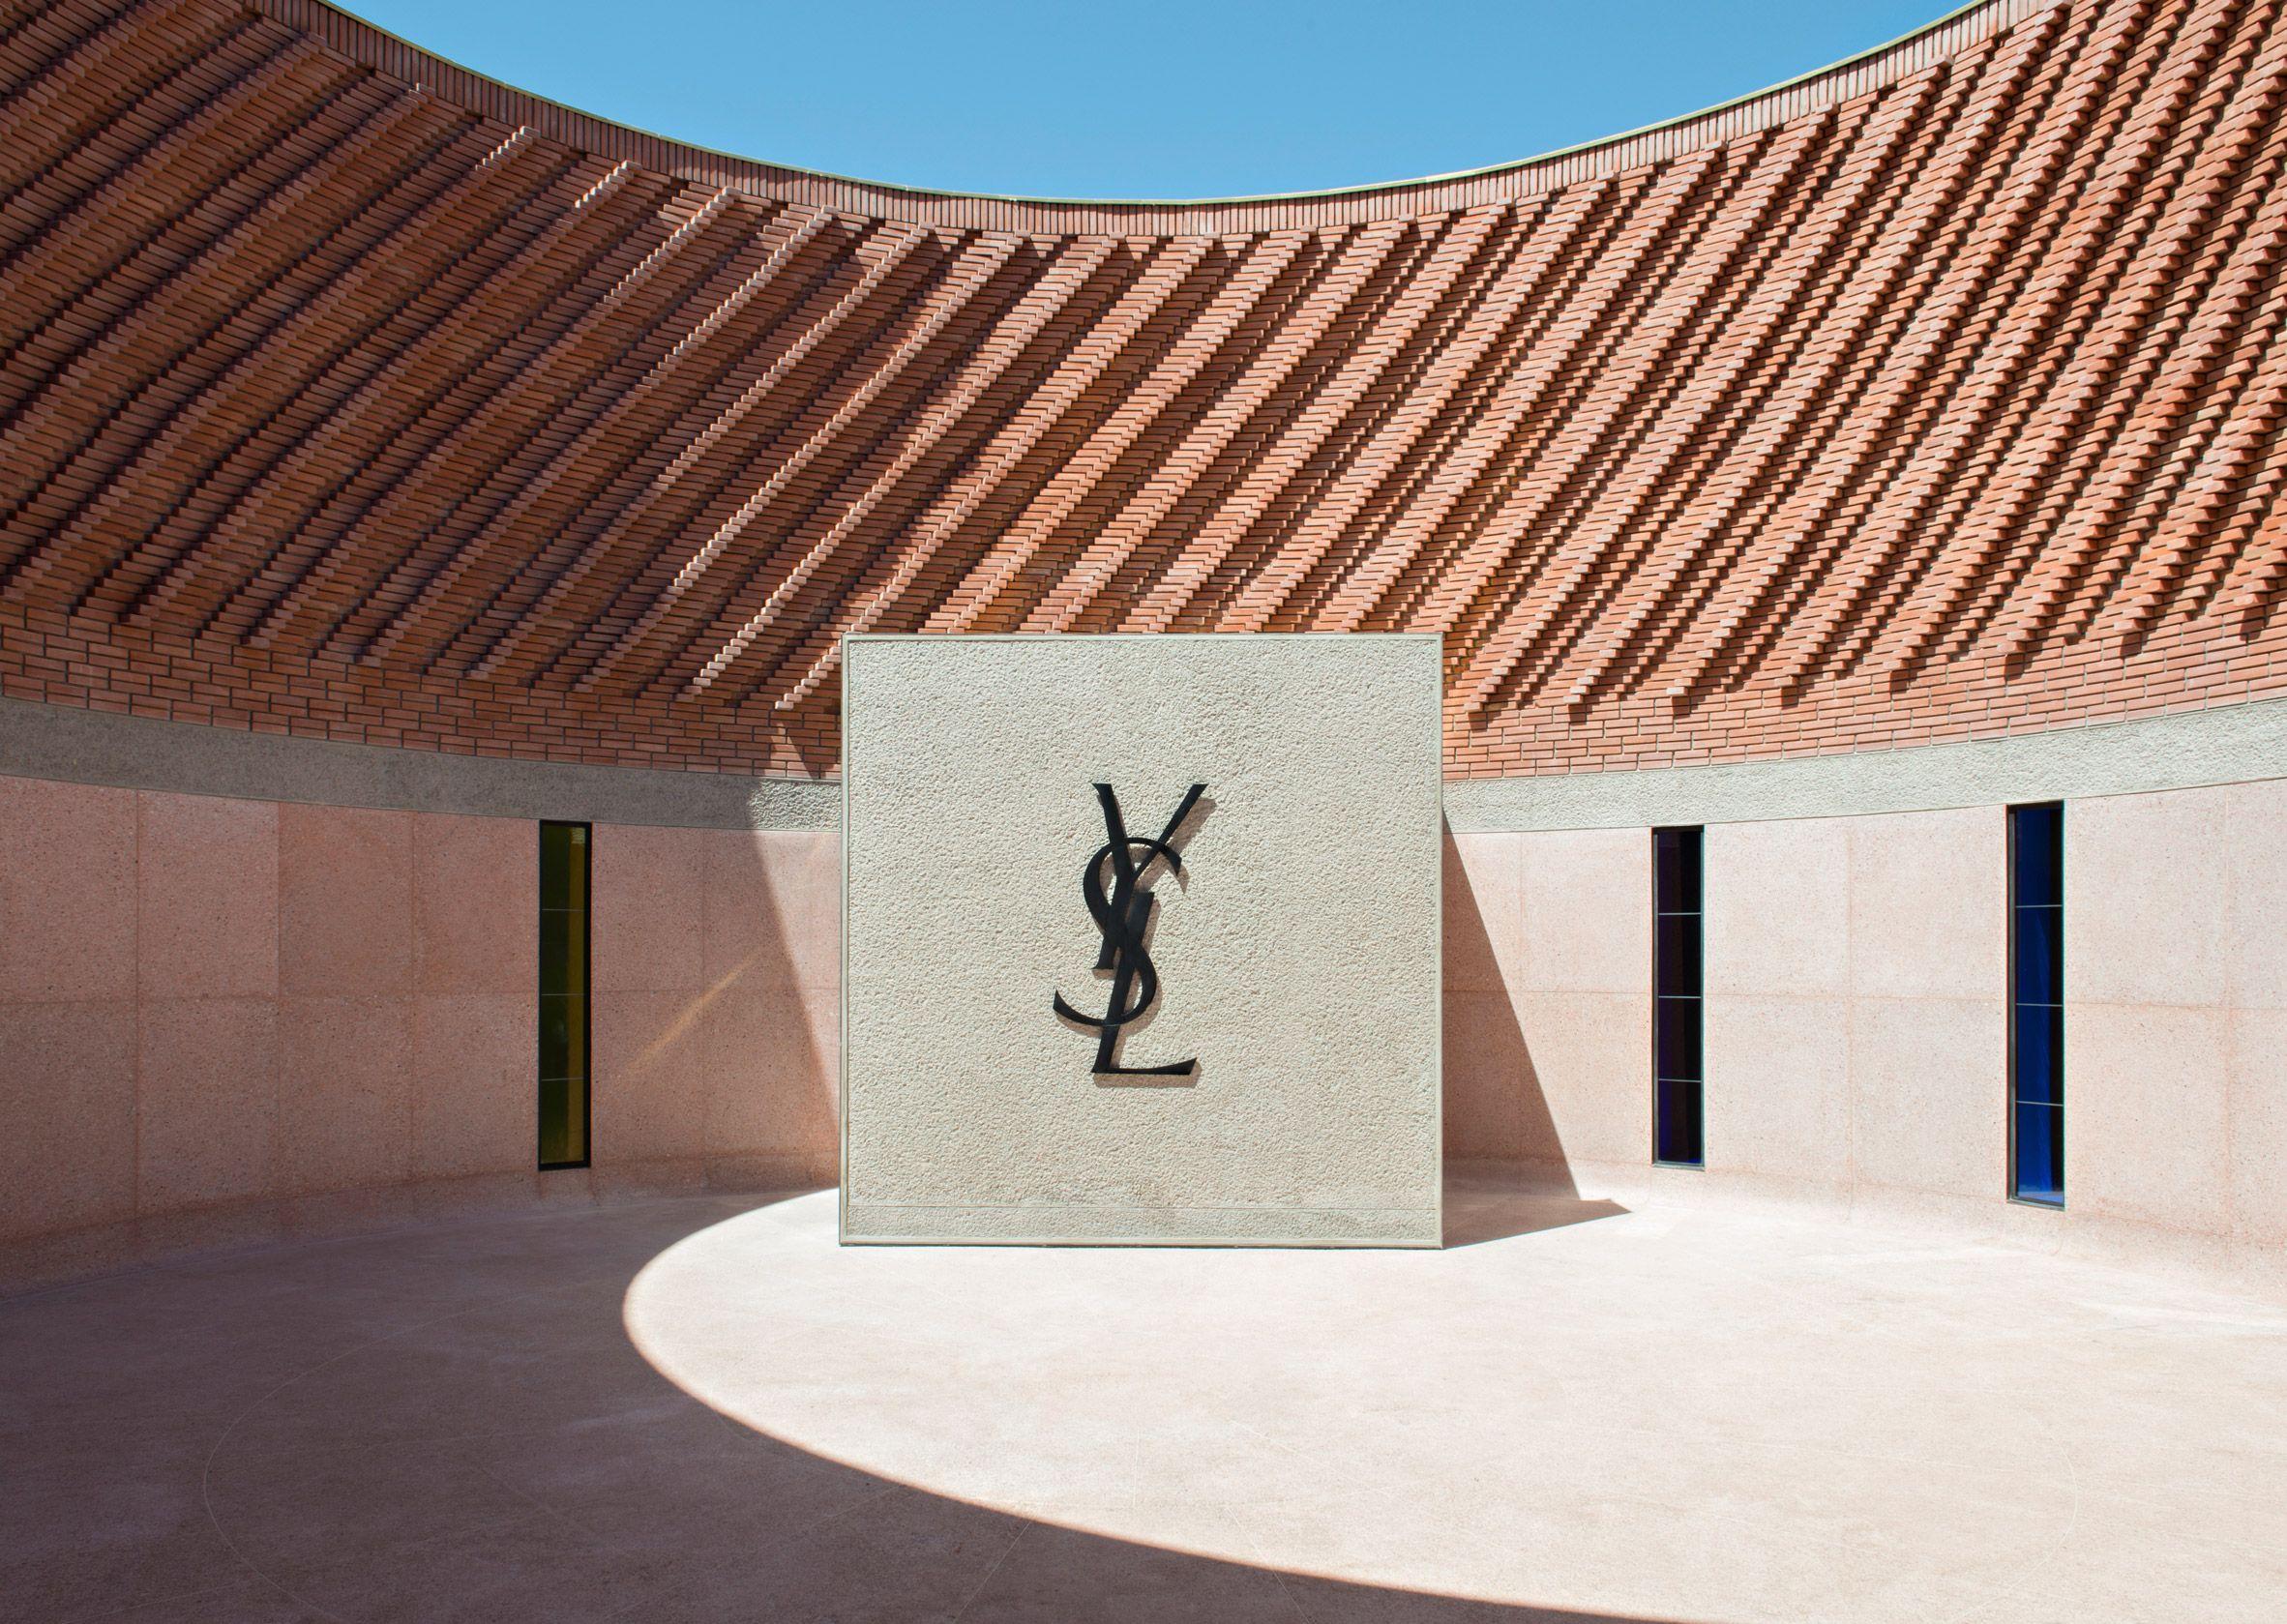 Studio KO celebrates Yves Saint Laurent s oeuvre in Marrakech museum